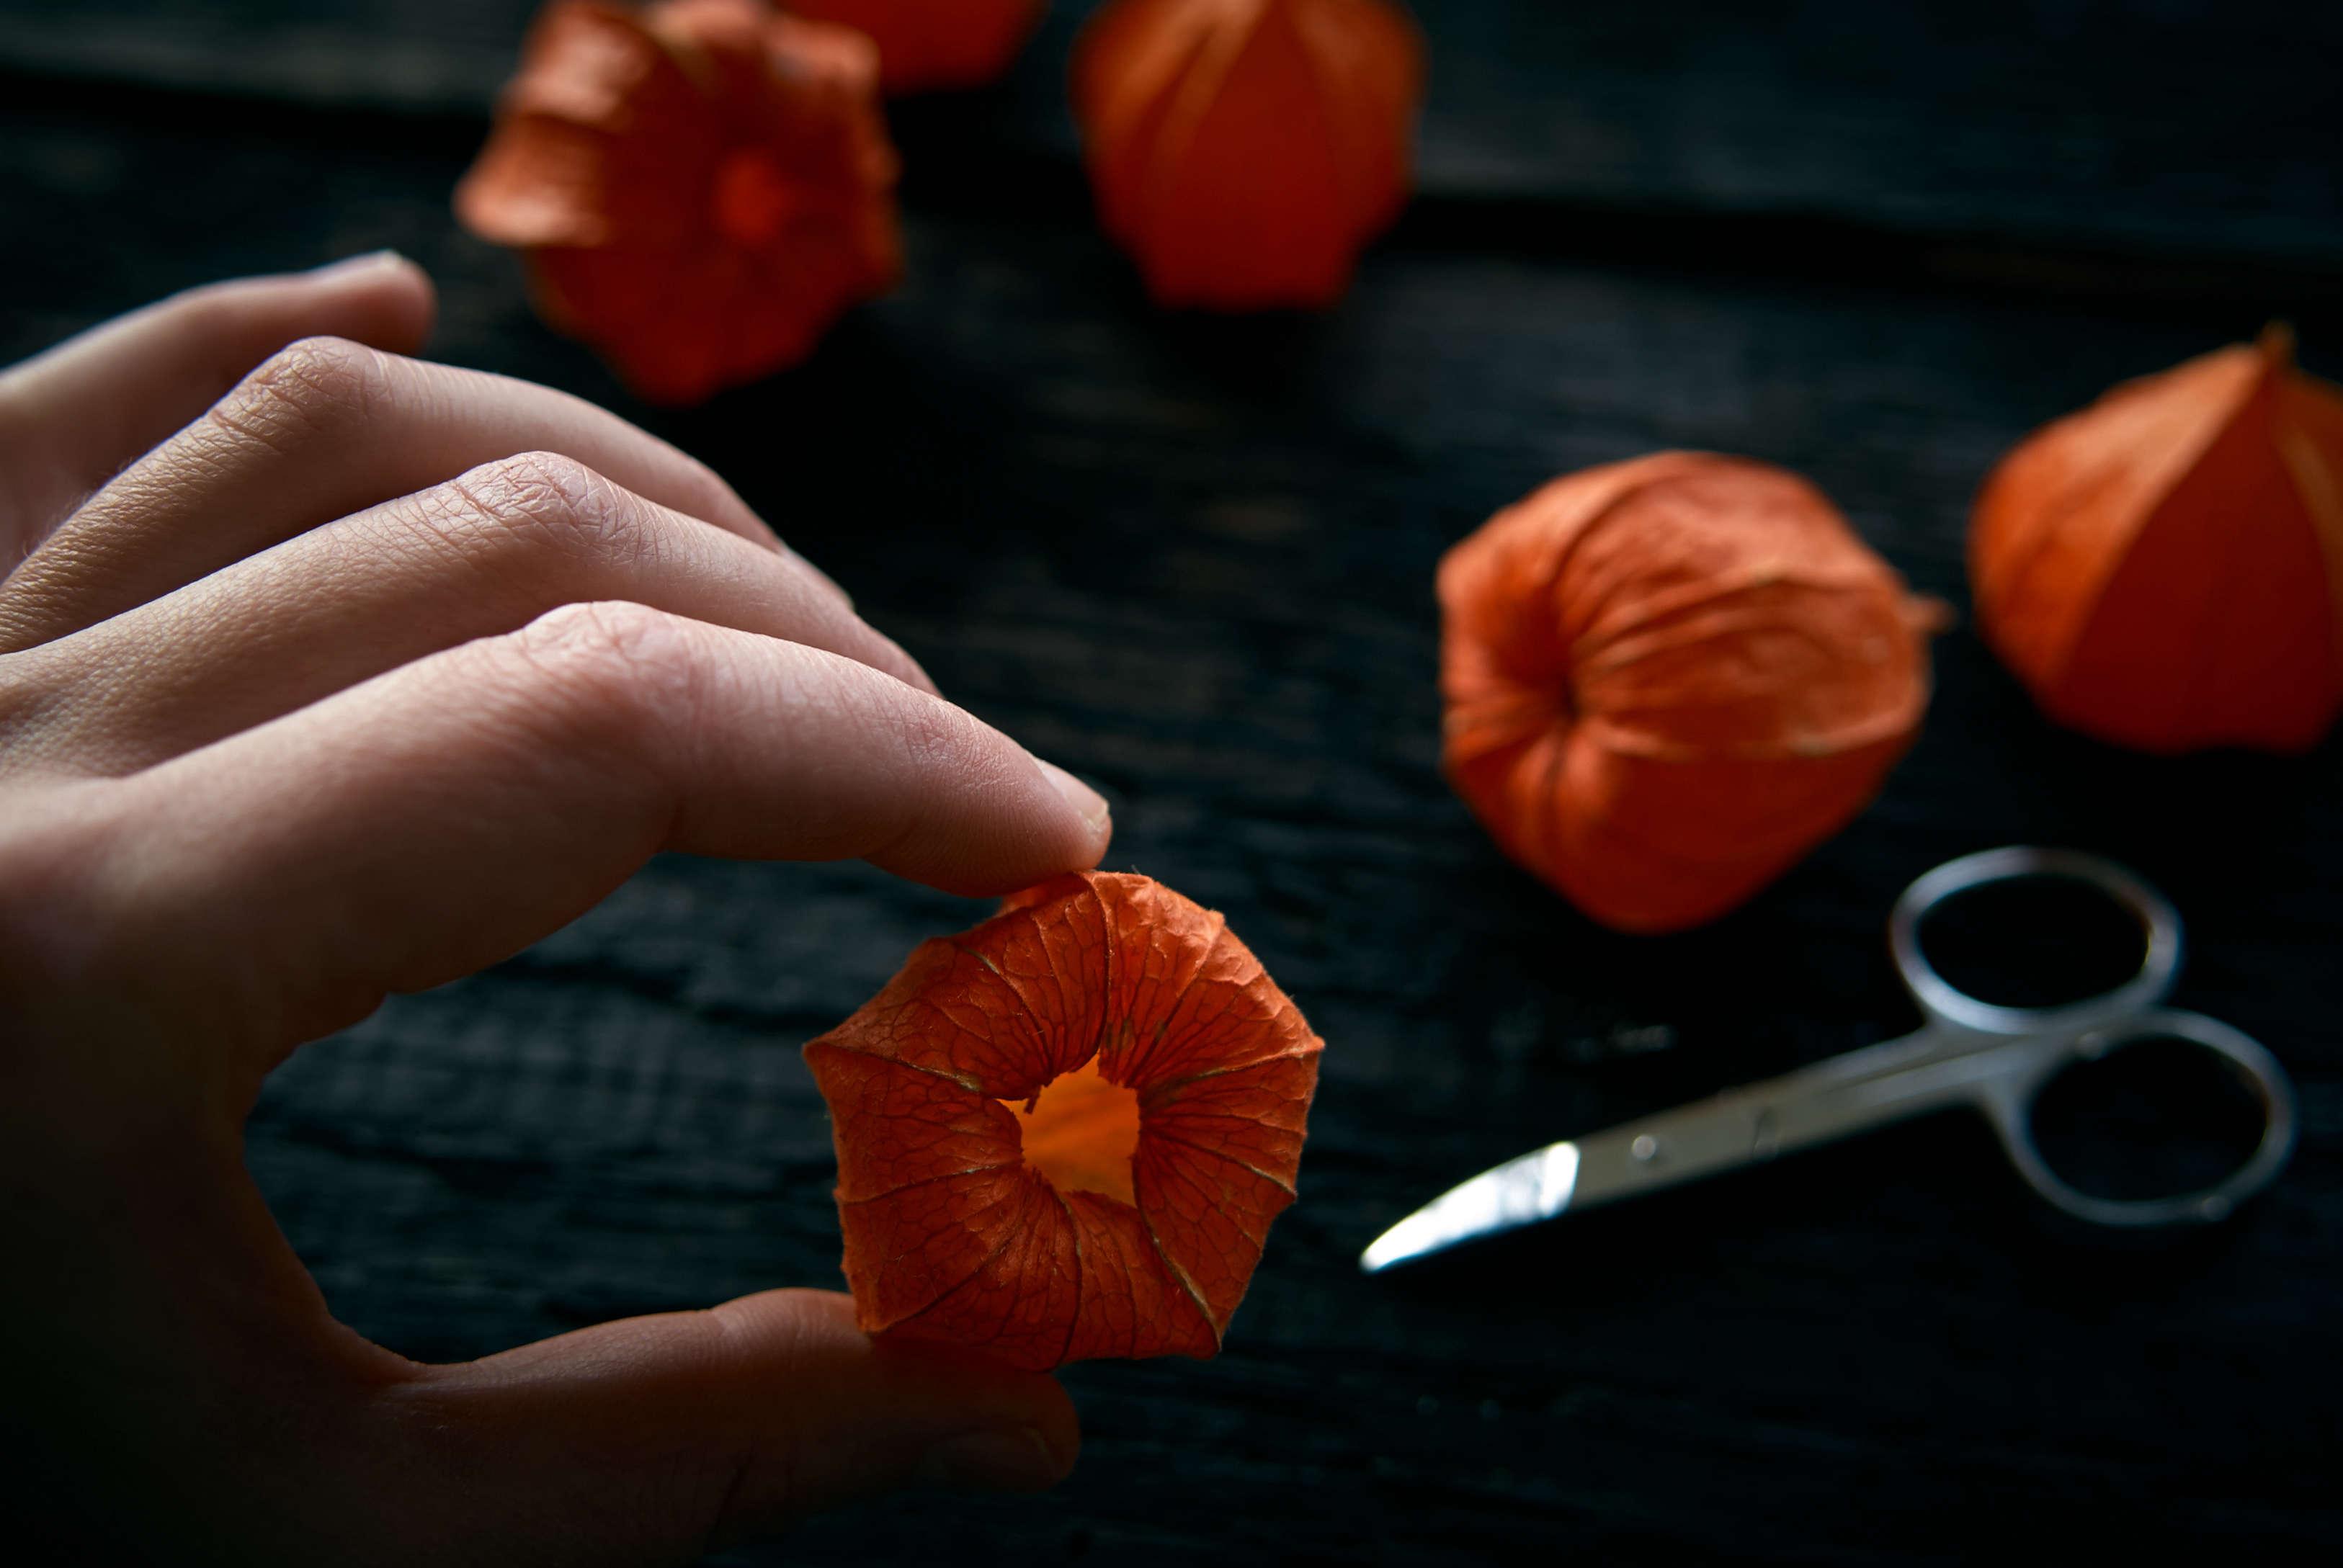 DIY: Pumpkin Lights Without the Plastic - Gardenista